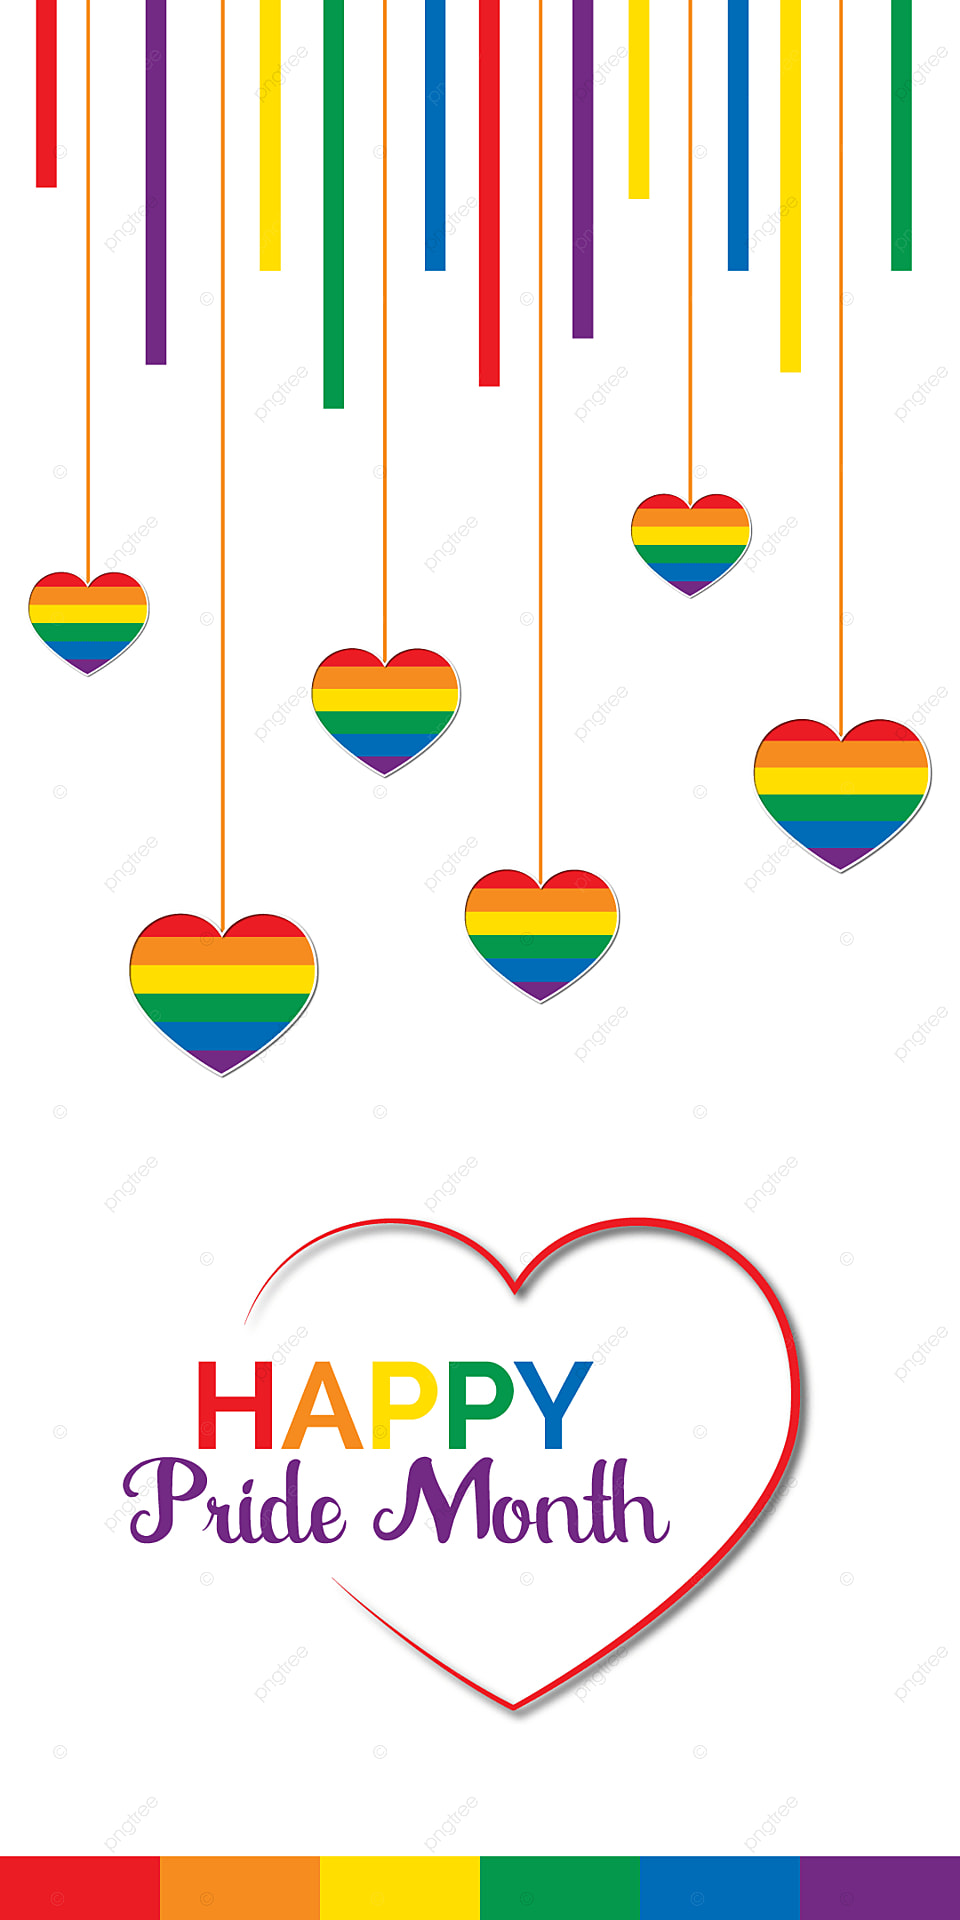 Happy Pride Month Wallpaper Design With Love Rainbow Design Gay 960x1920